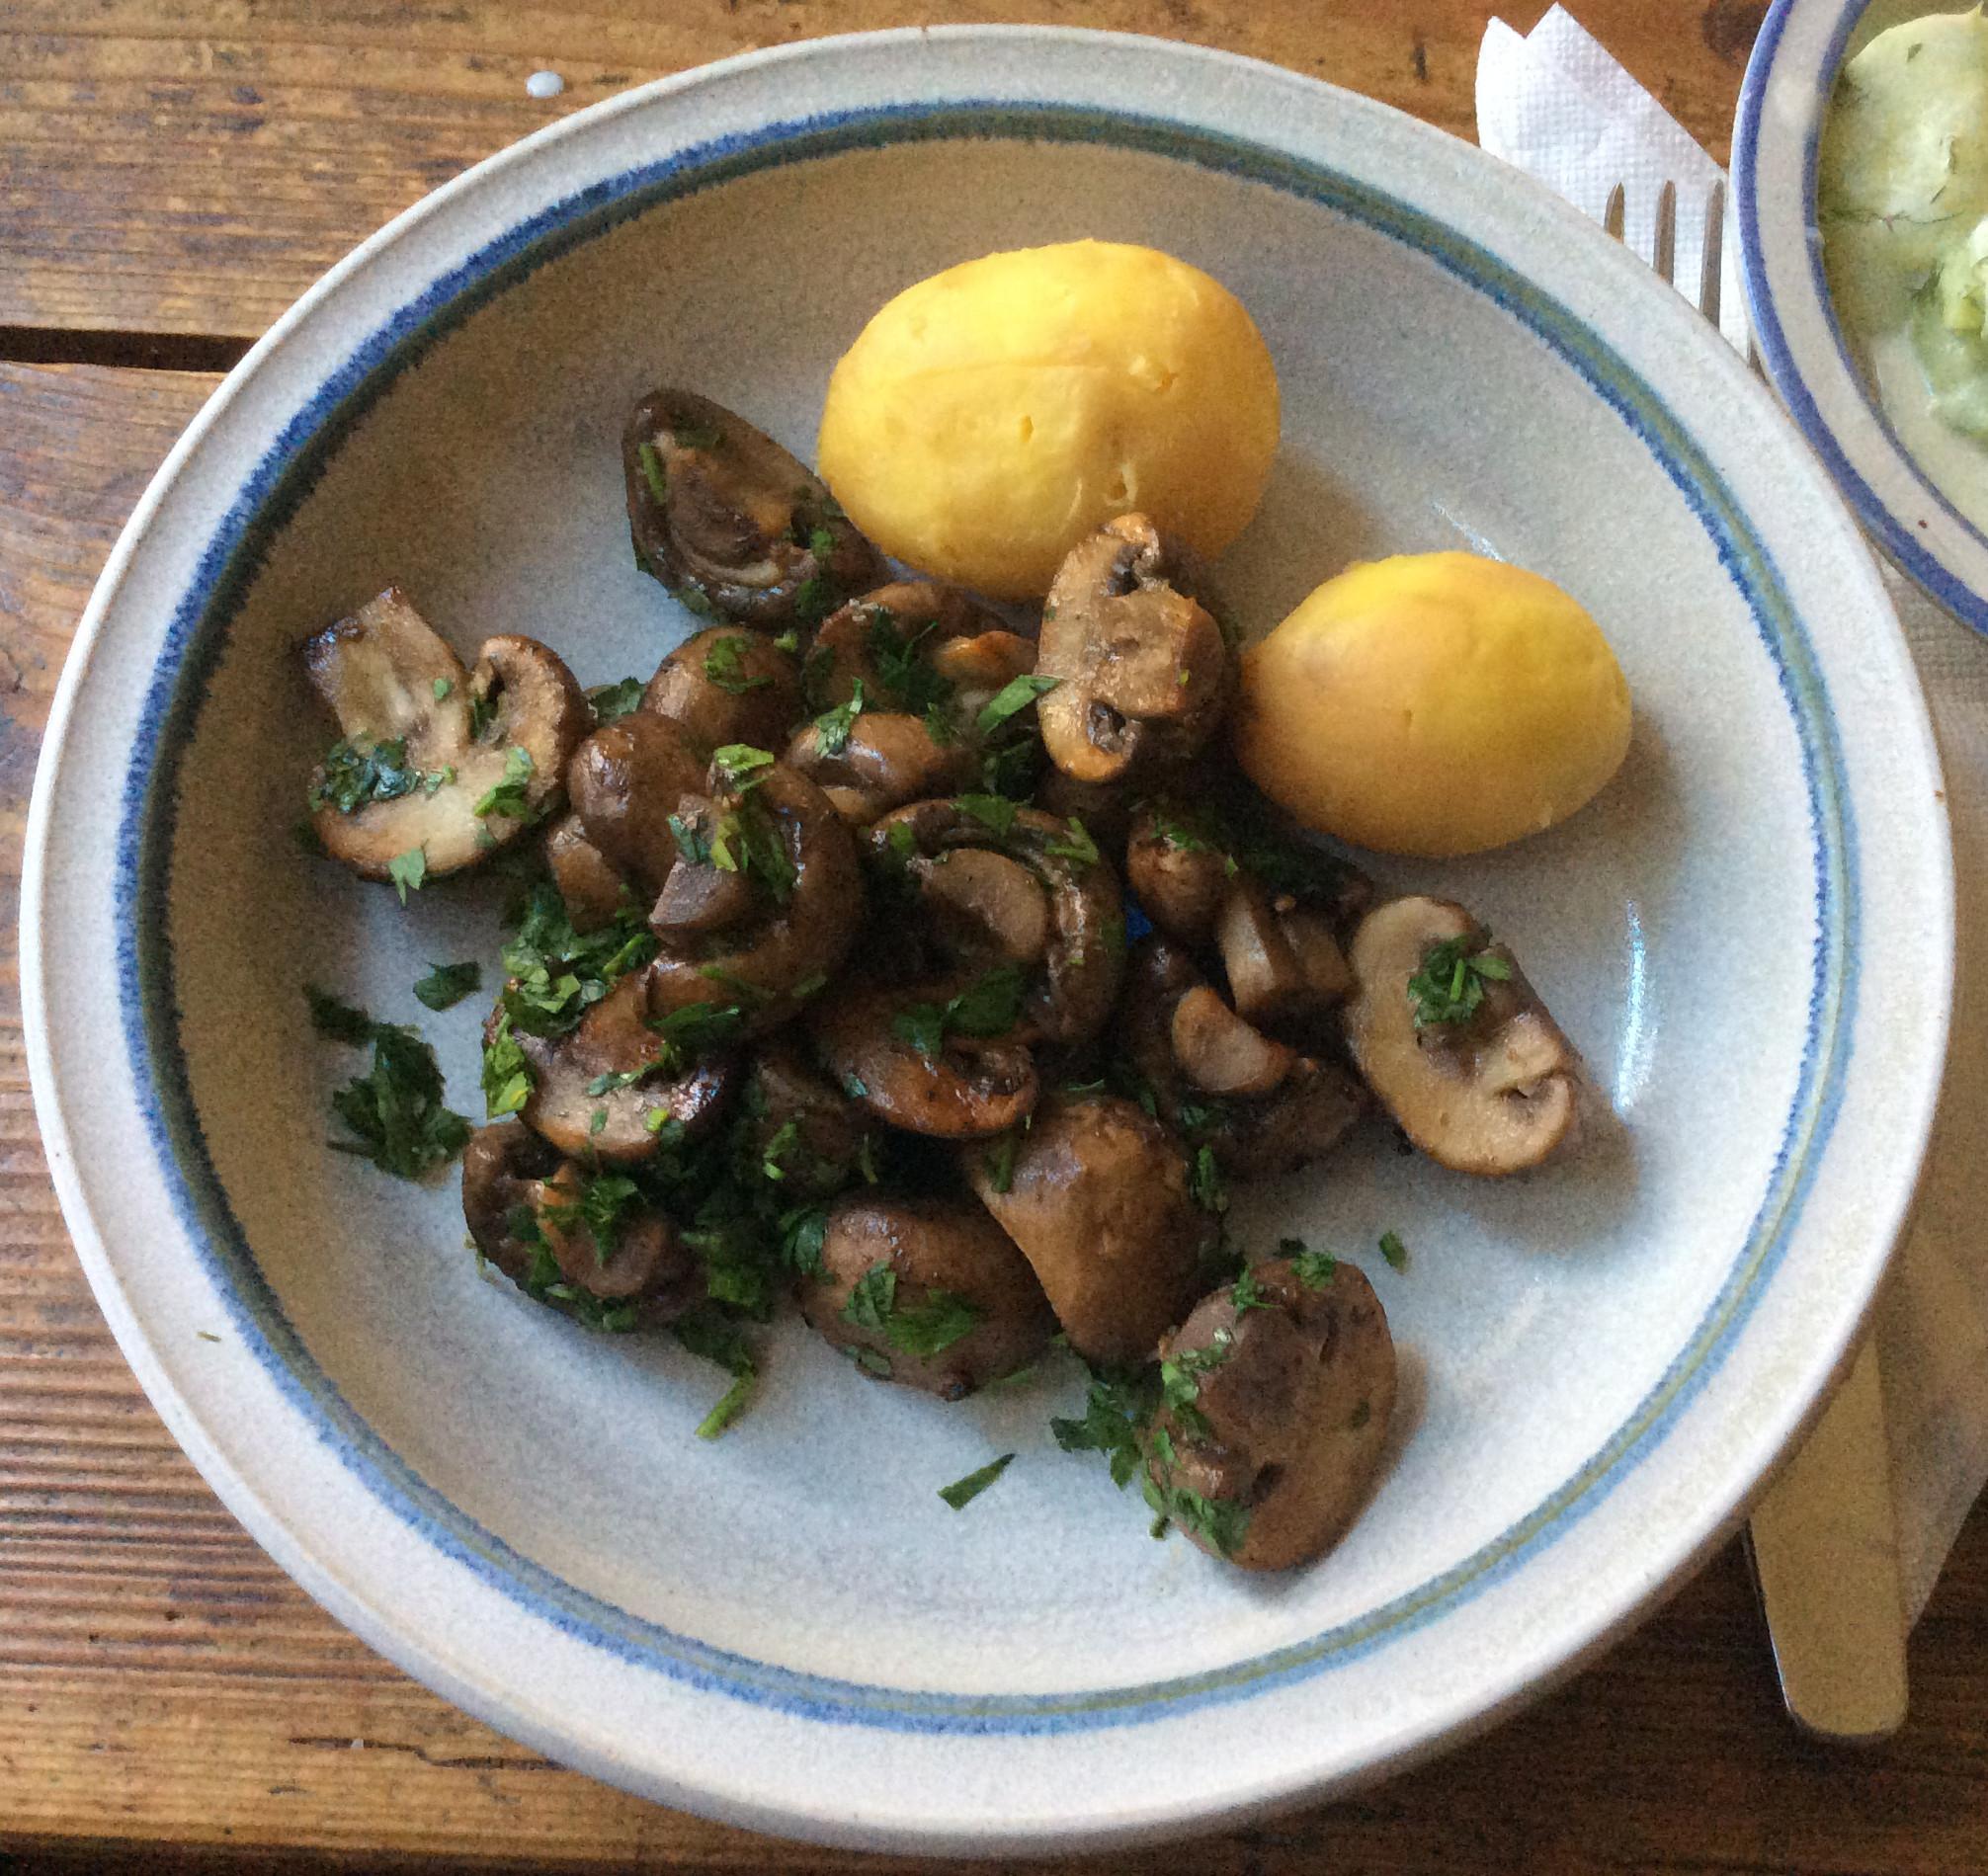 Champignon,Kartoffeln,Dessert -16.11.15   (8)